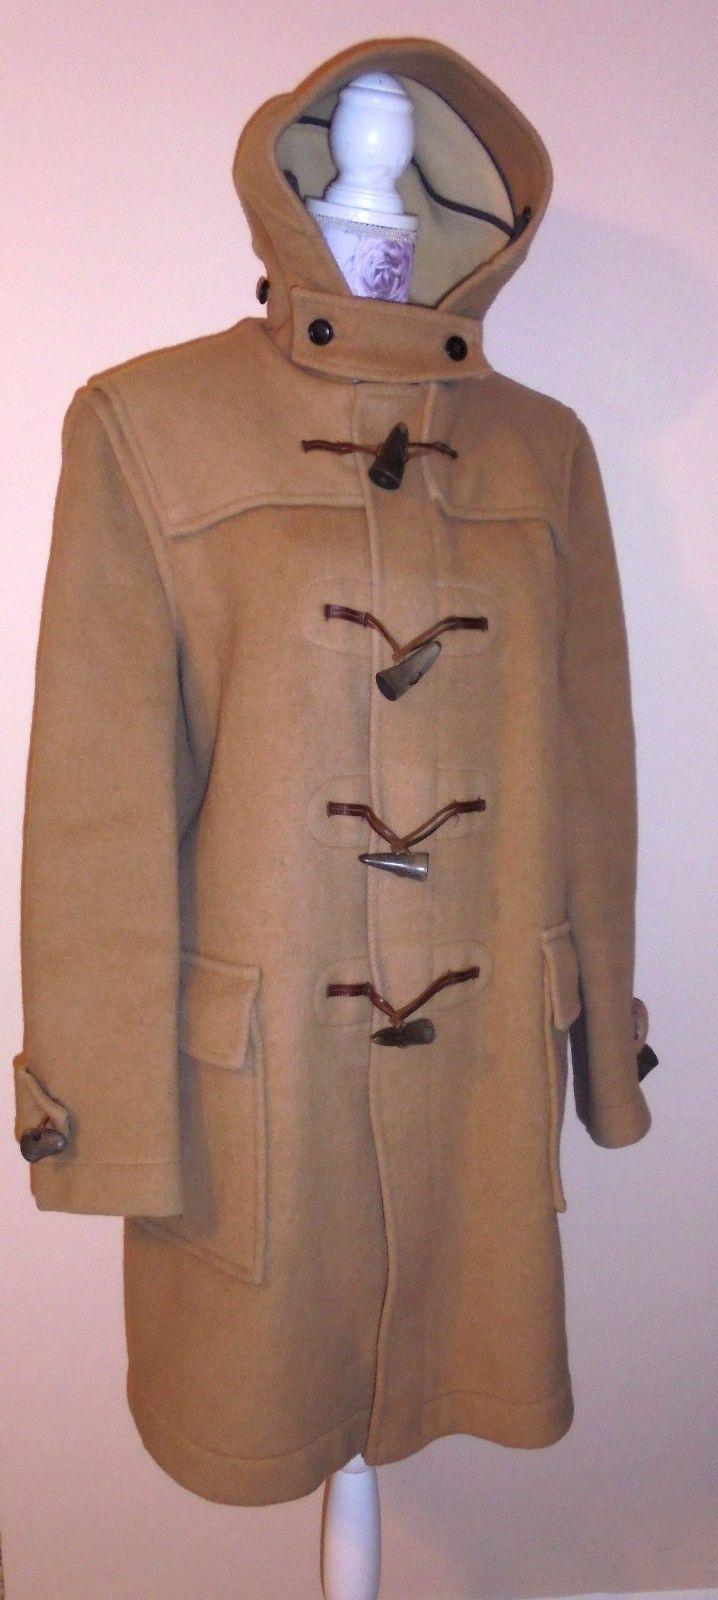 Vtg Gloverall of London Dolomite Duffle Coat Mens Jacket Tan Camel WOOL 40